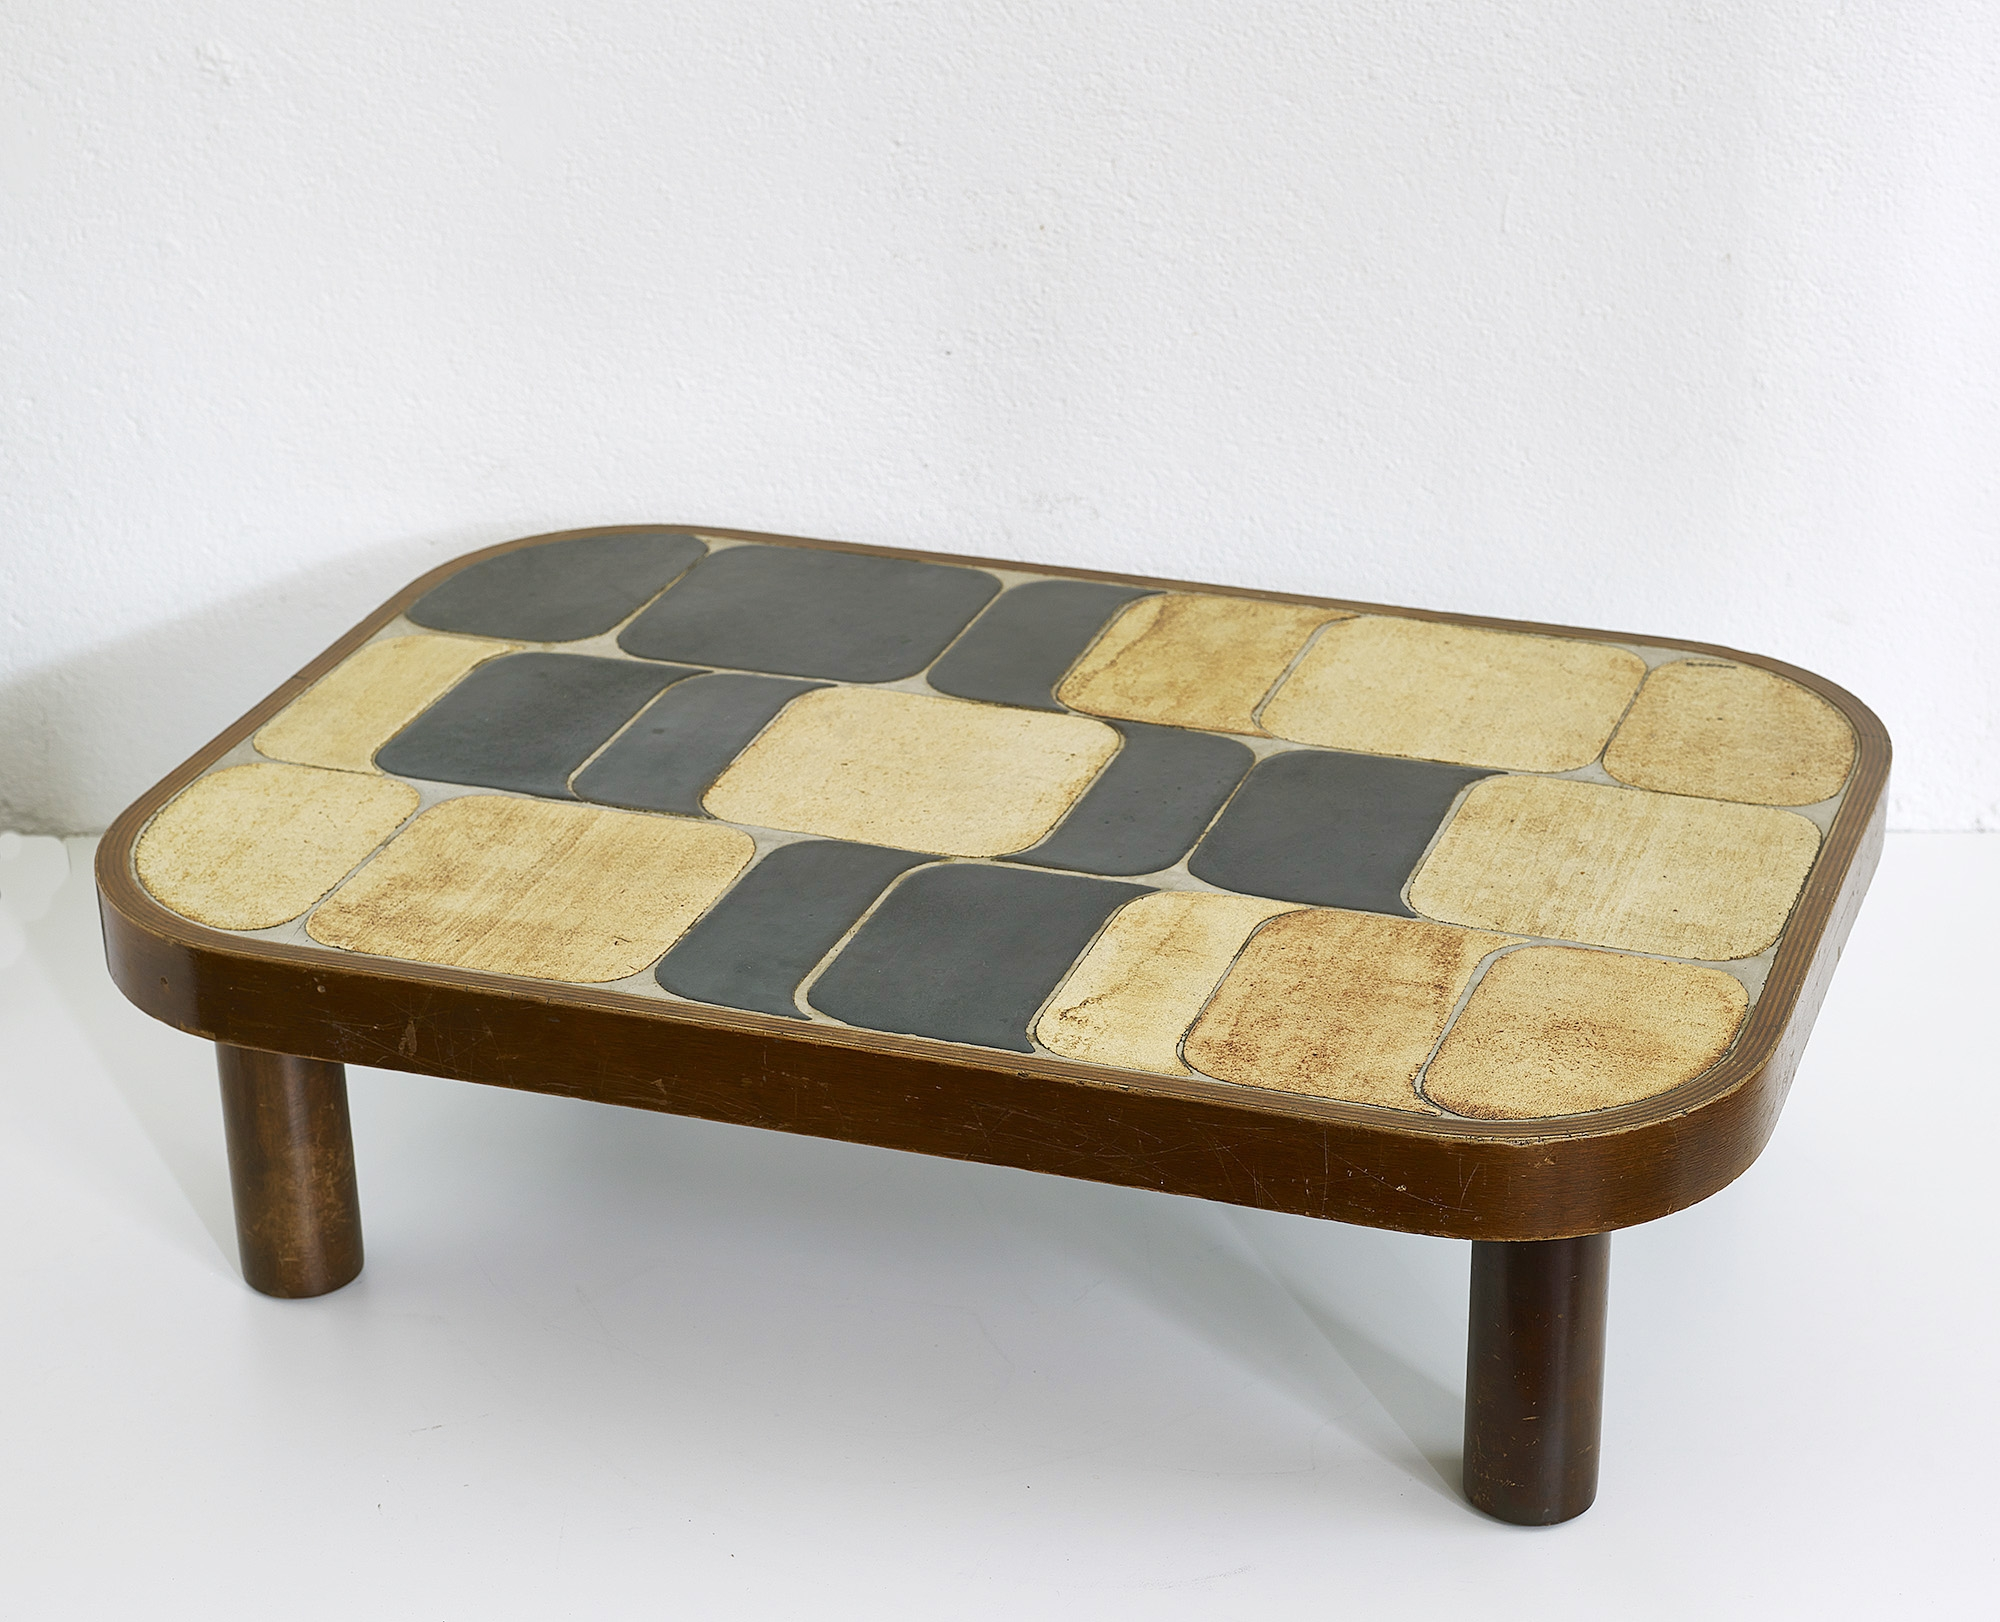 table-basse-shogun-de-roger-capron-image-06